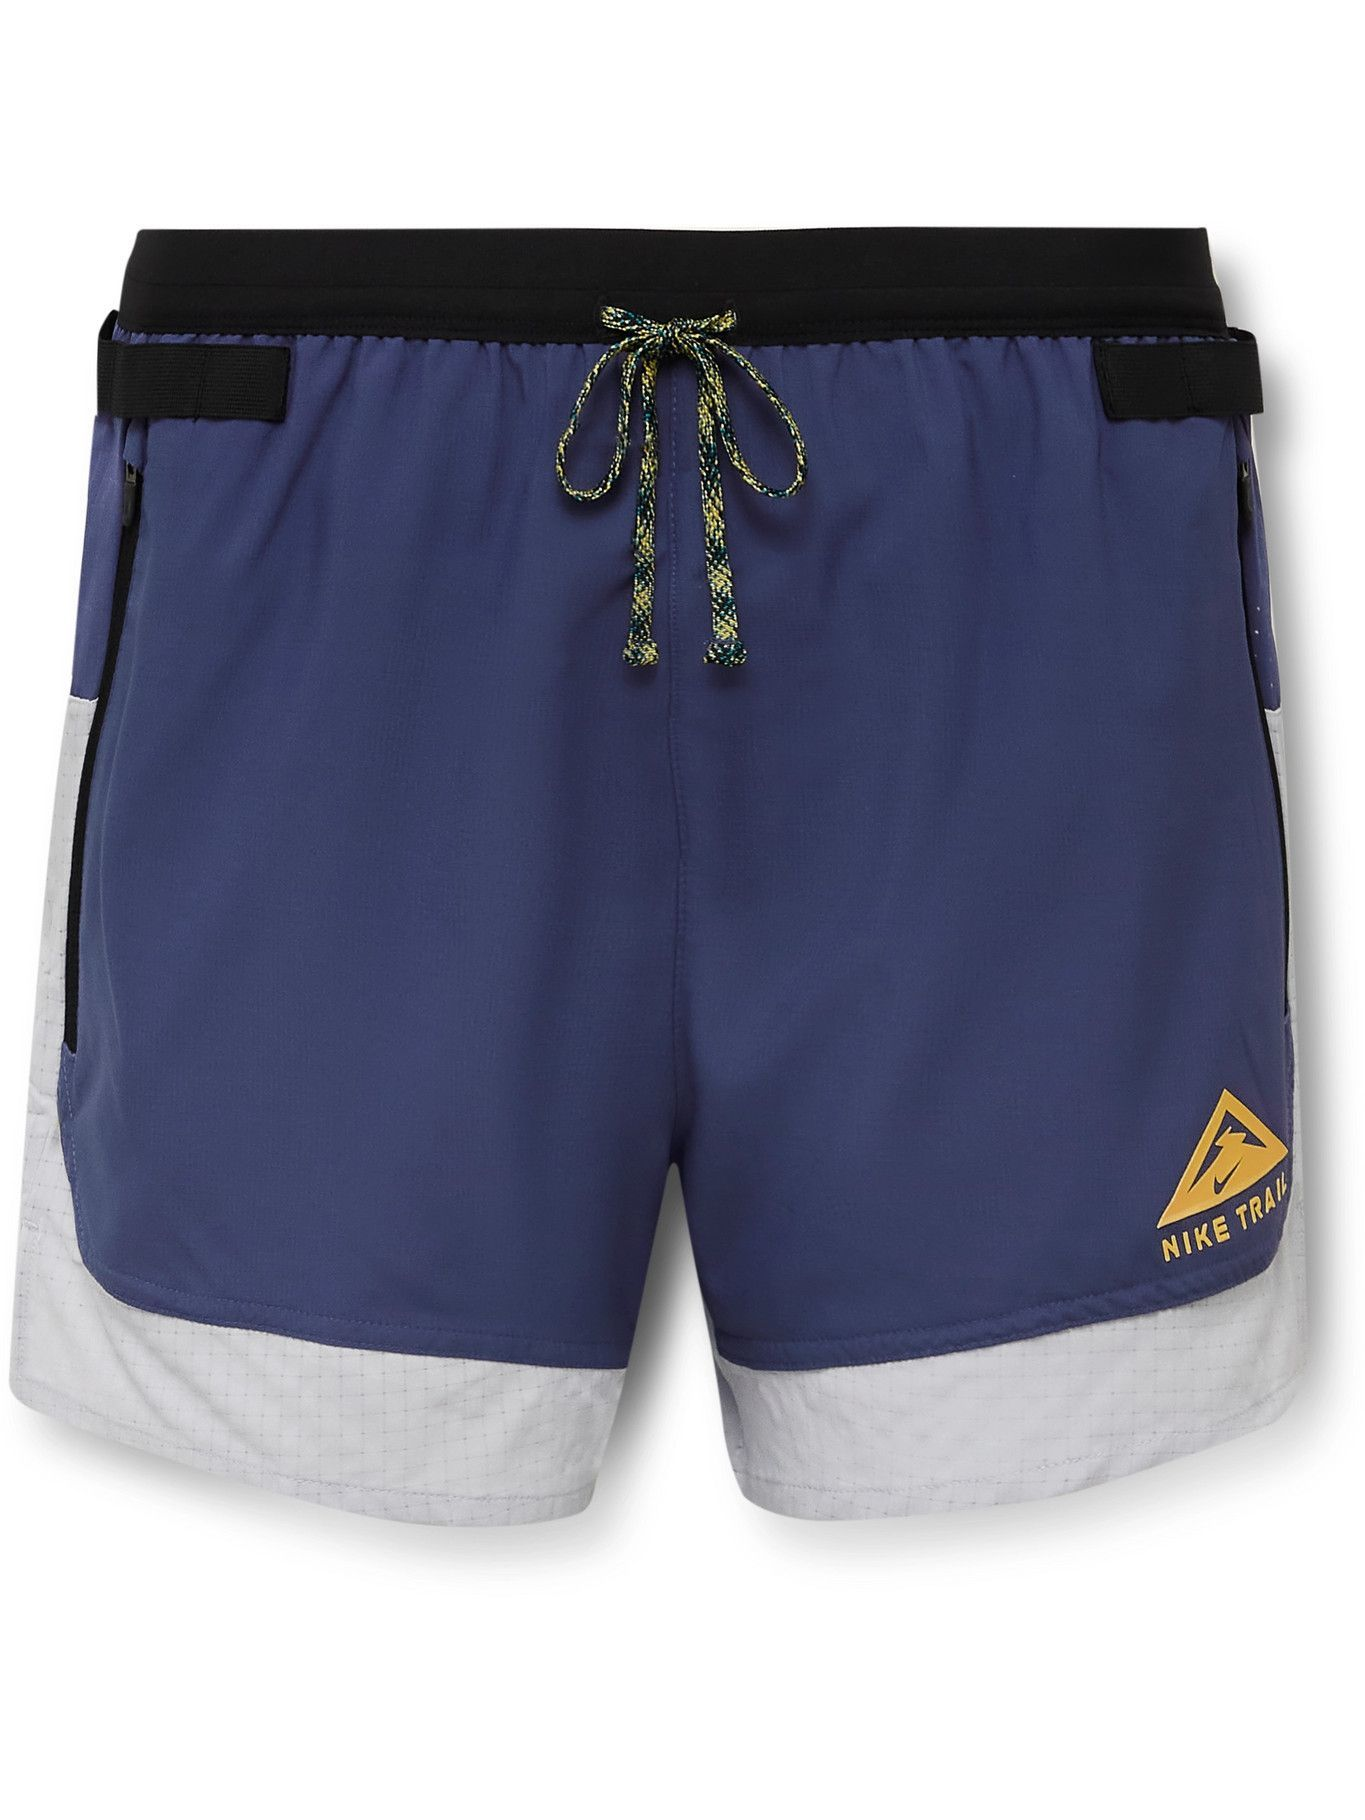 Photo: NIKE RUNNING - Flex Stride Dri-FIT Ripstop Shorts - Purple